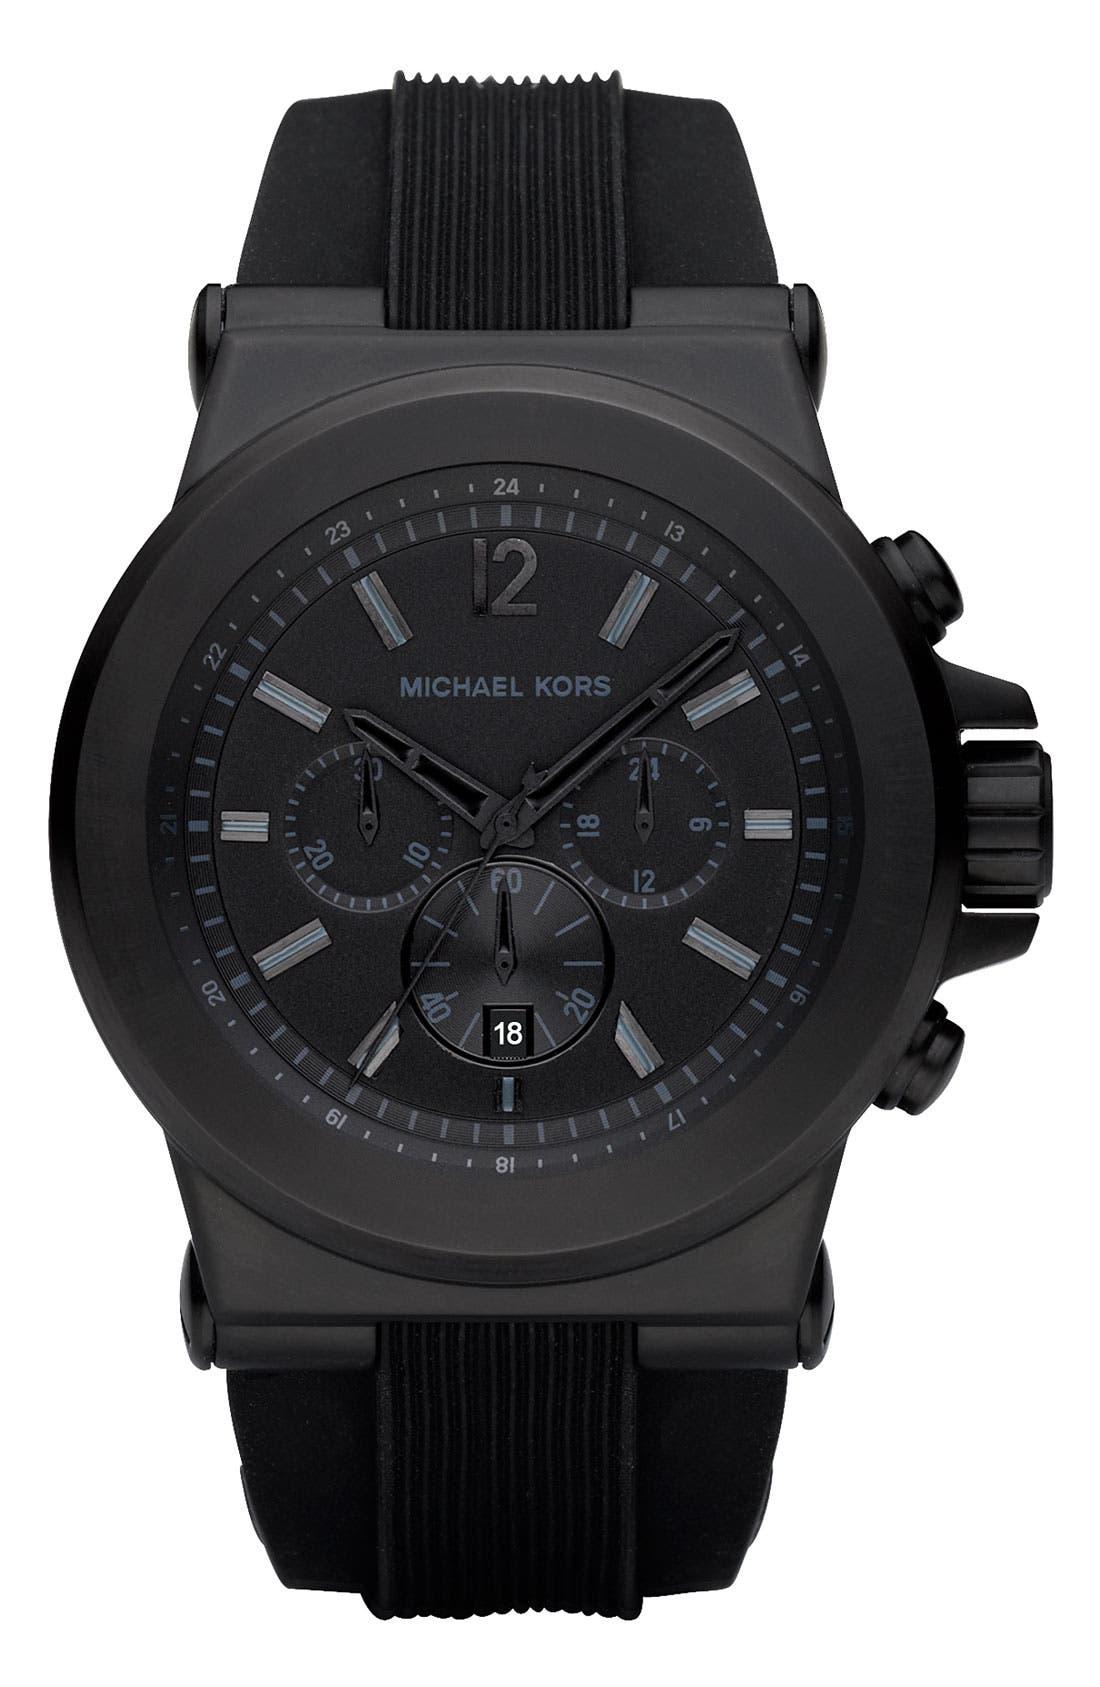 MICHAEL KORS, Chronograph Watch, 45mm, Main thumbnail 1, color, 001